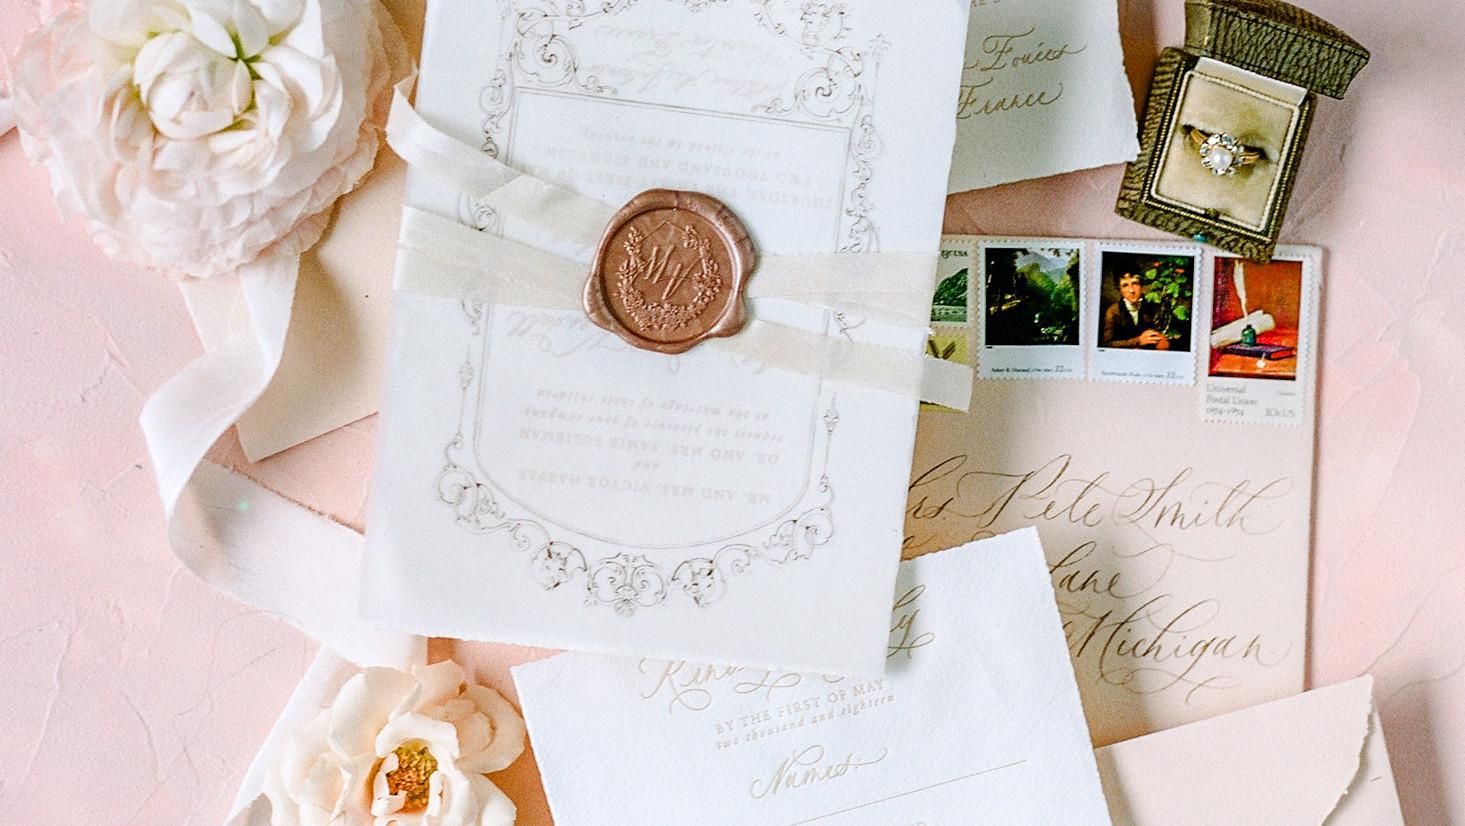 Martha Stewart Wedding Invitation: What Are Courtesy Wedding Invitations?